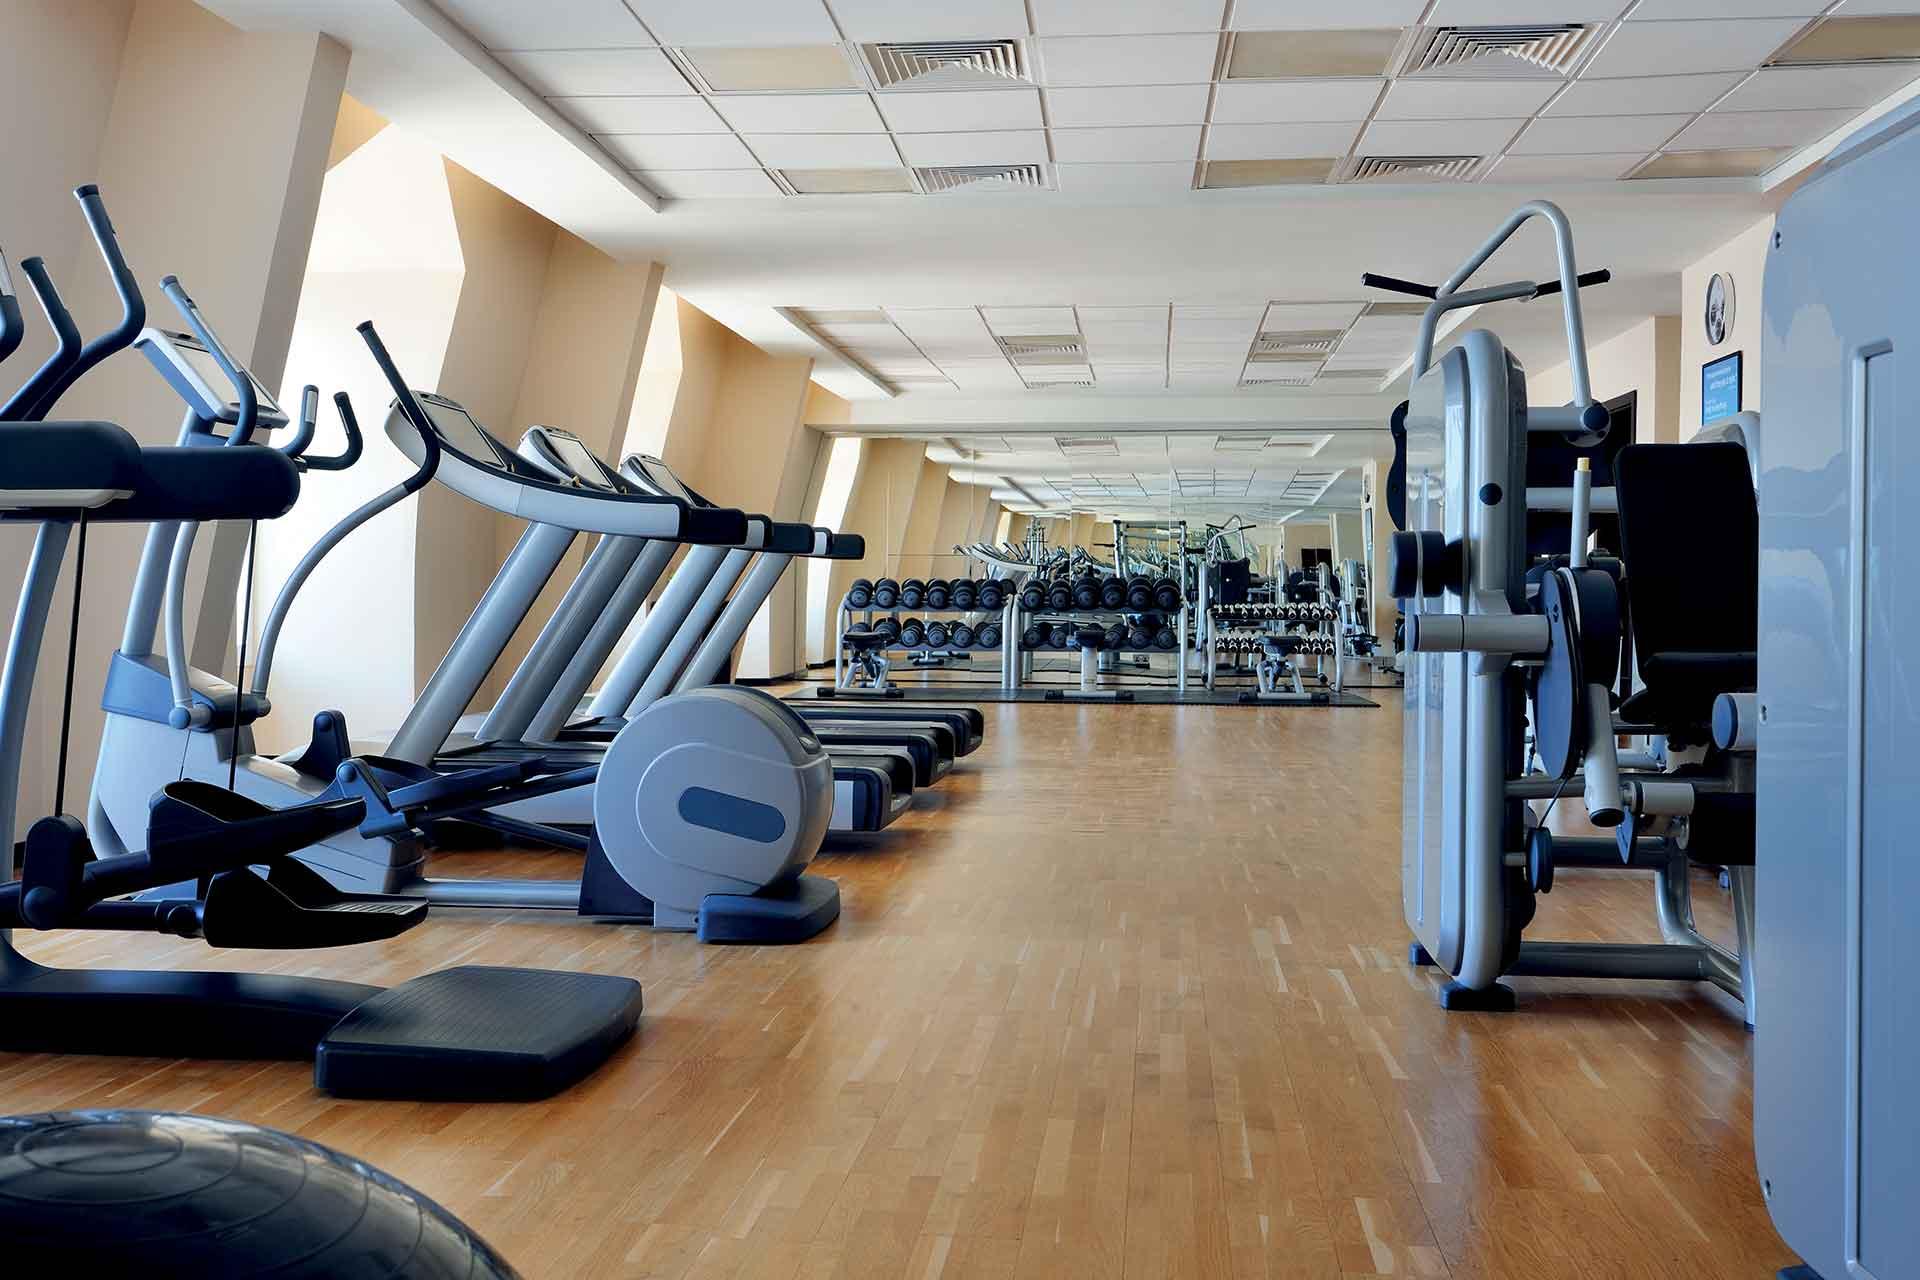 AVANI Deira Dubai Gym interior